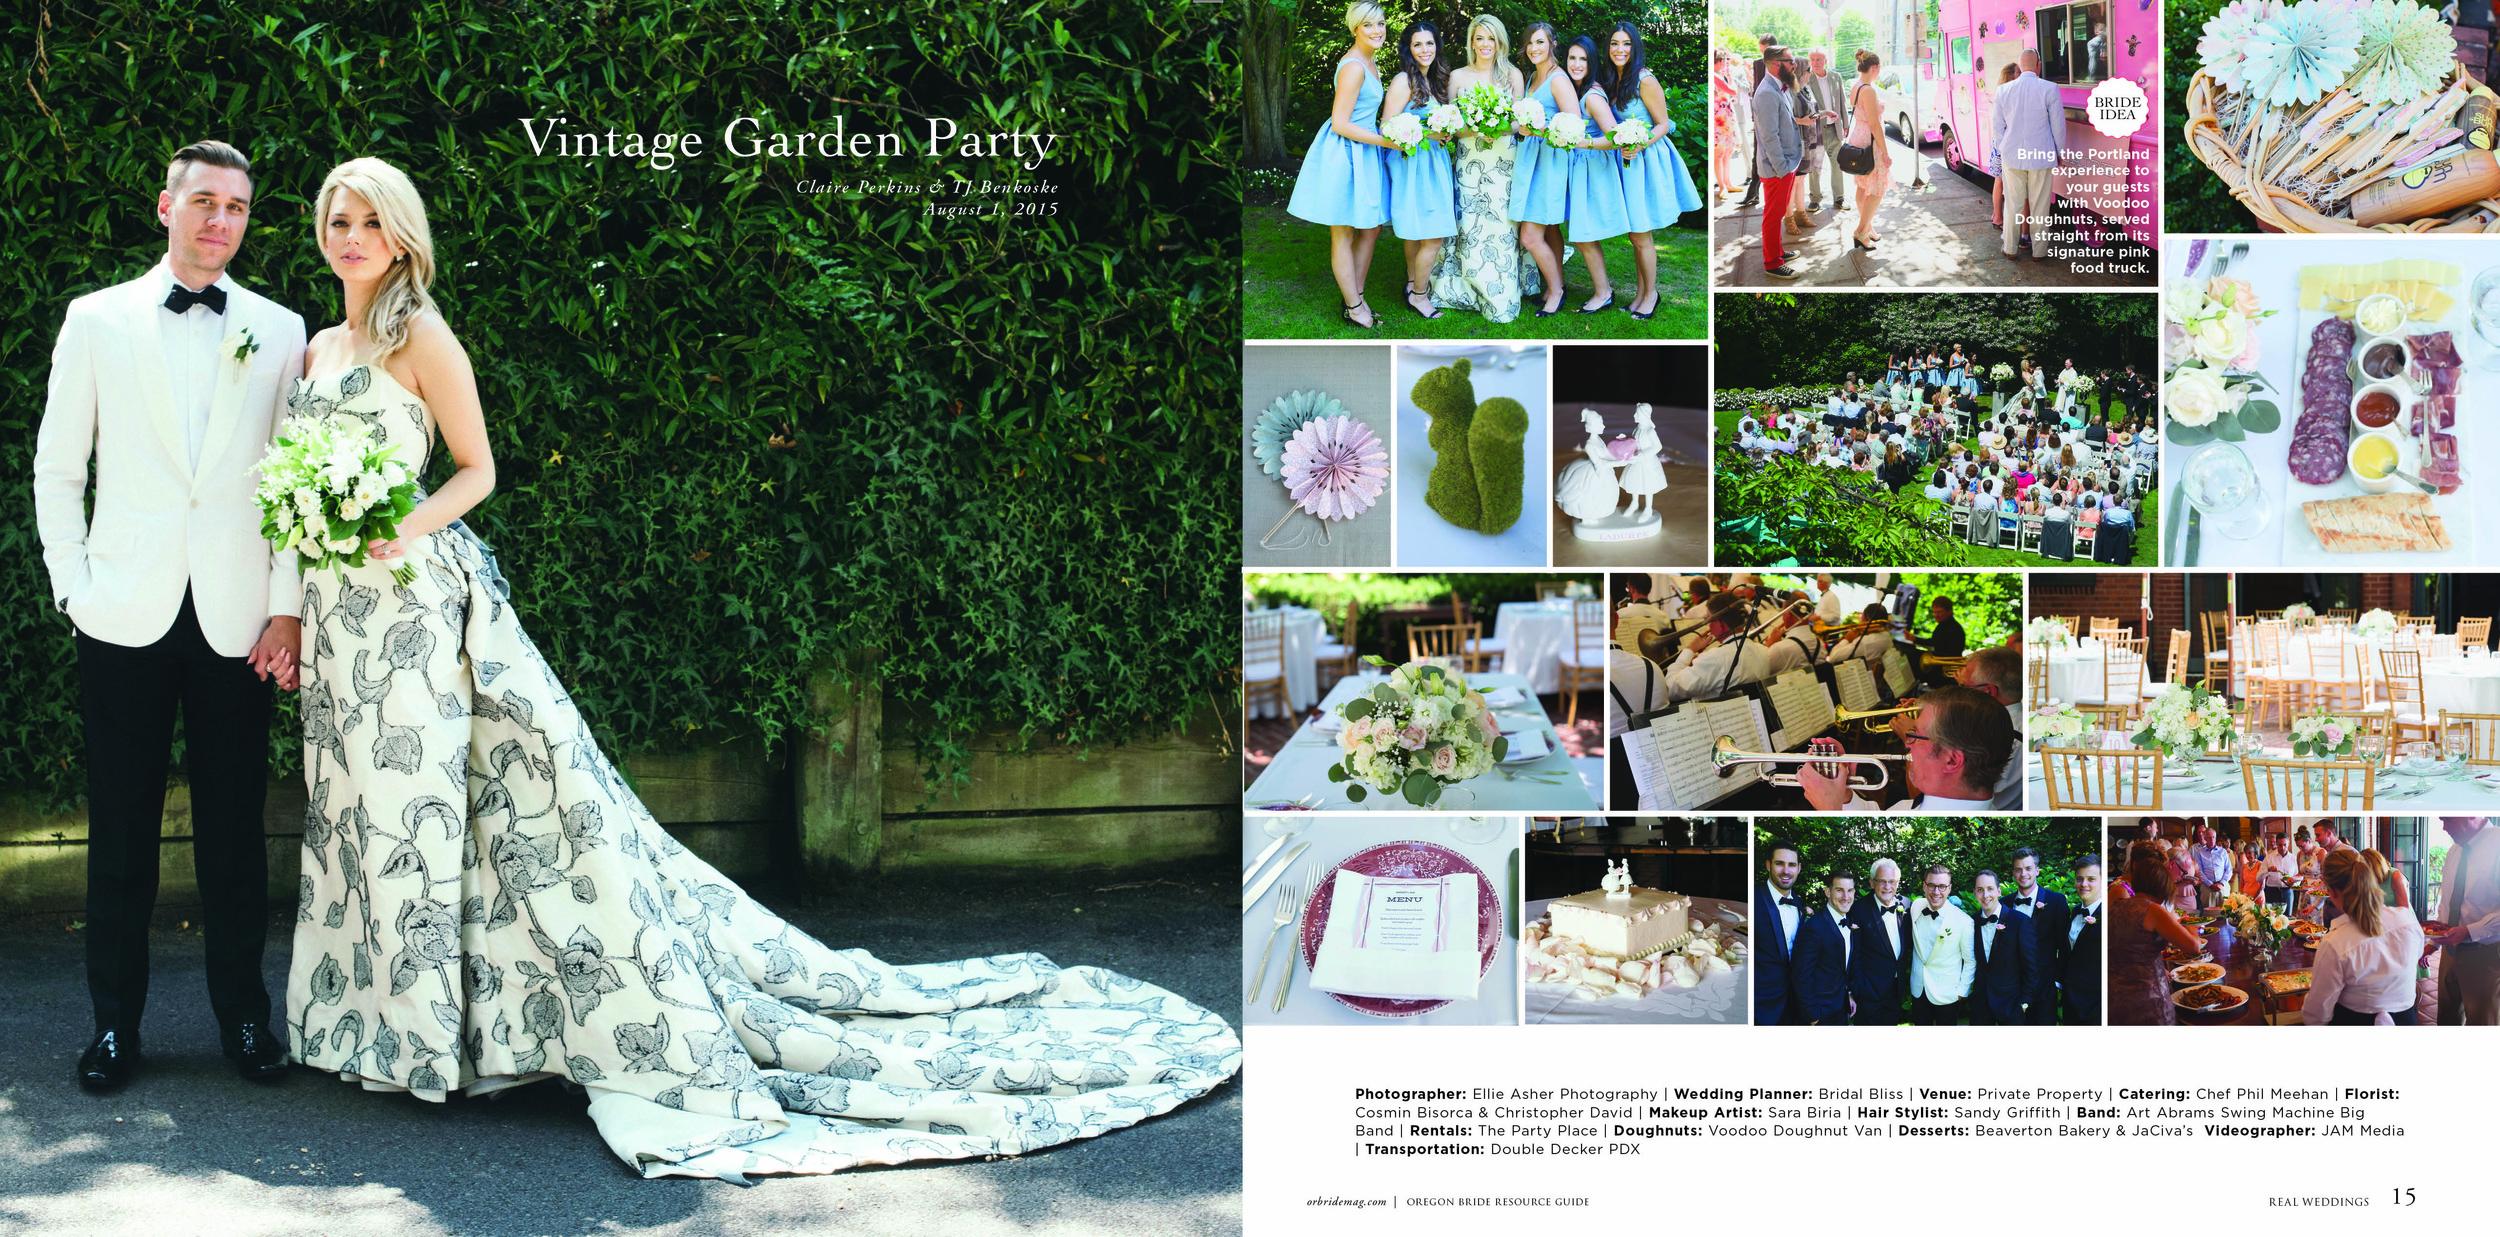 Bridalbliss.com | Portland Wedding | Oregon Event Planning and Design | Ellie Asher Photography | Christopher David Floral